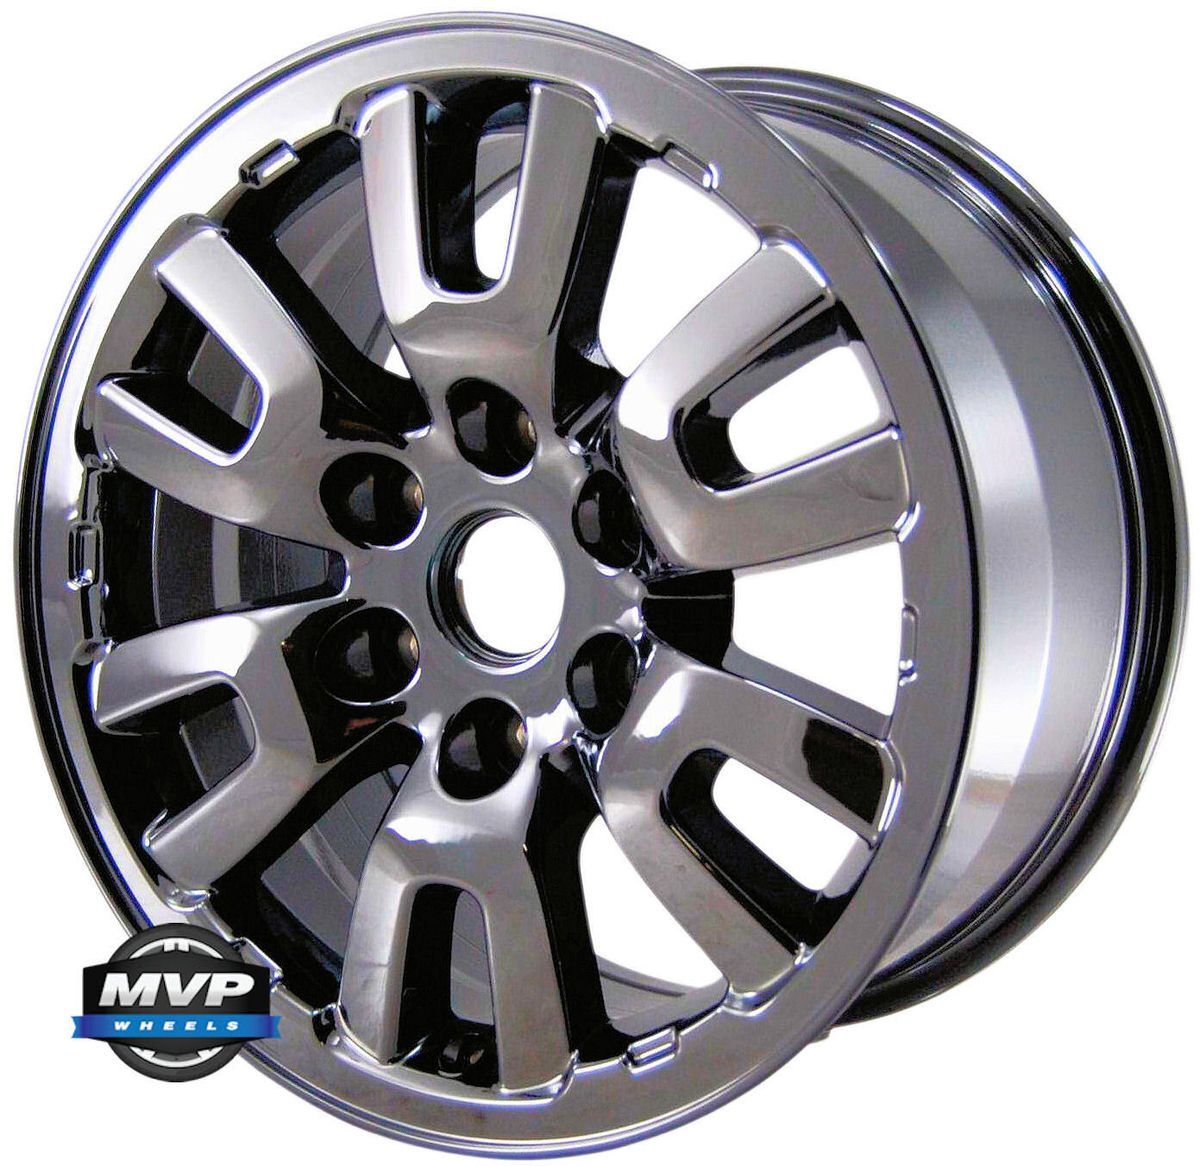 Factory 17 17 Ford F 150 Black Chrome Raptor Wheel Rim 3831 PVDRN Set